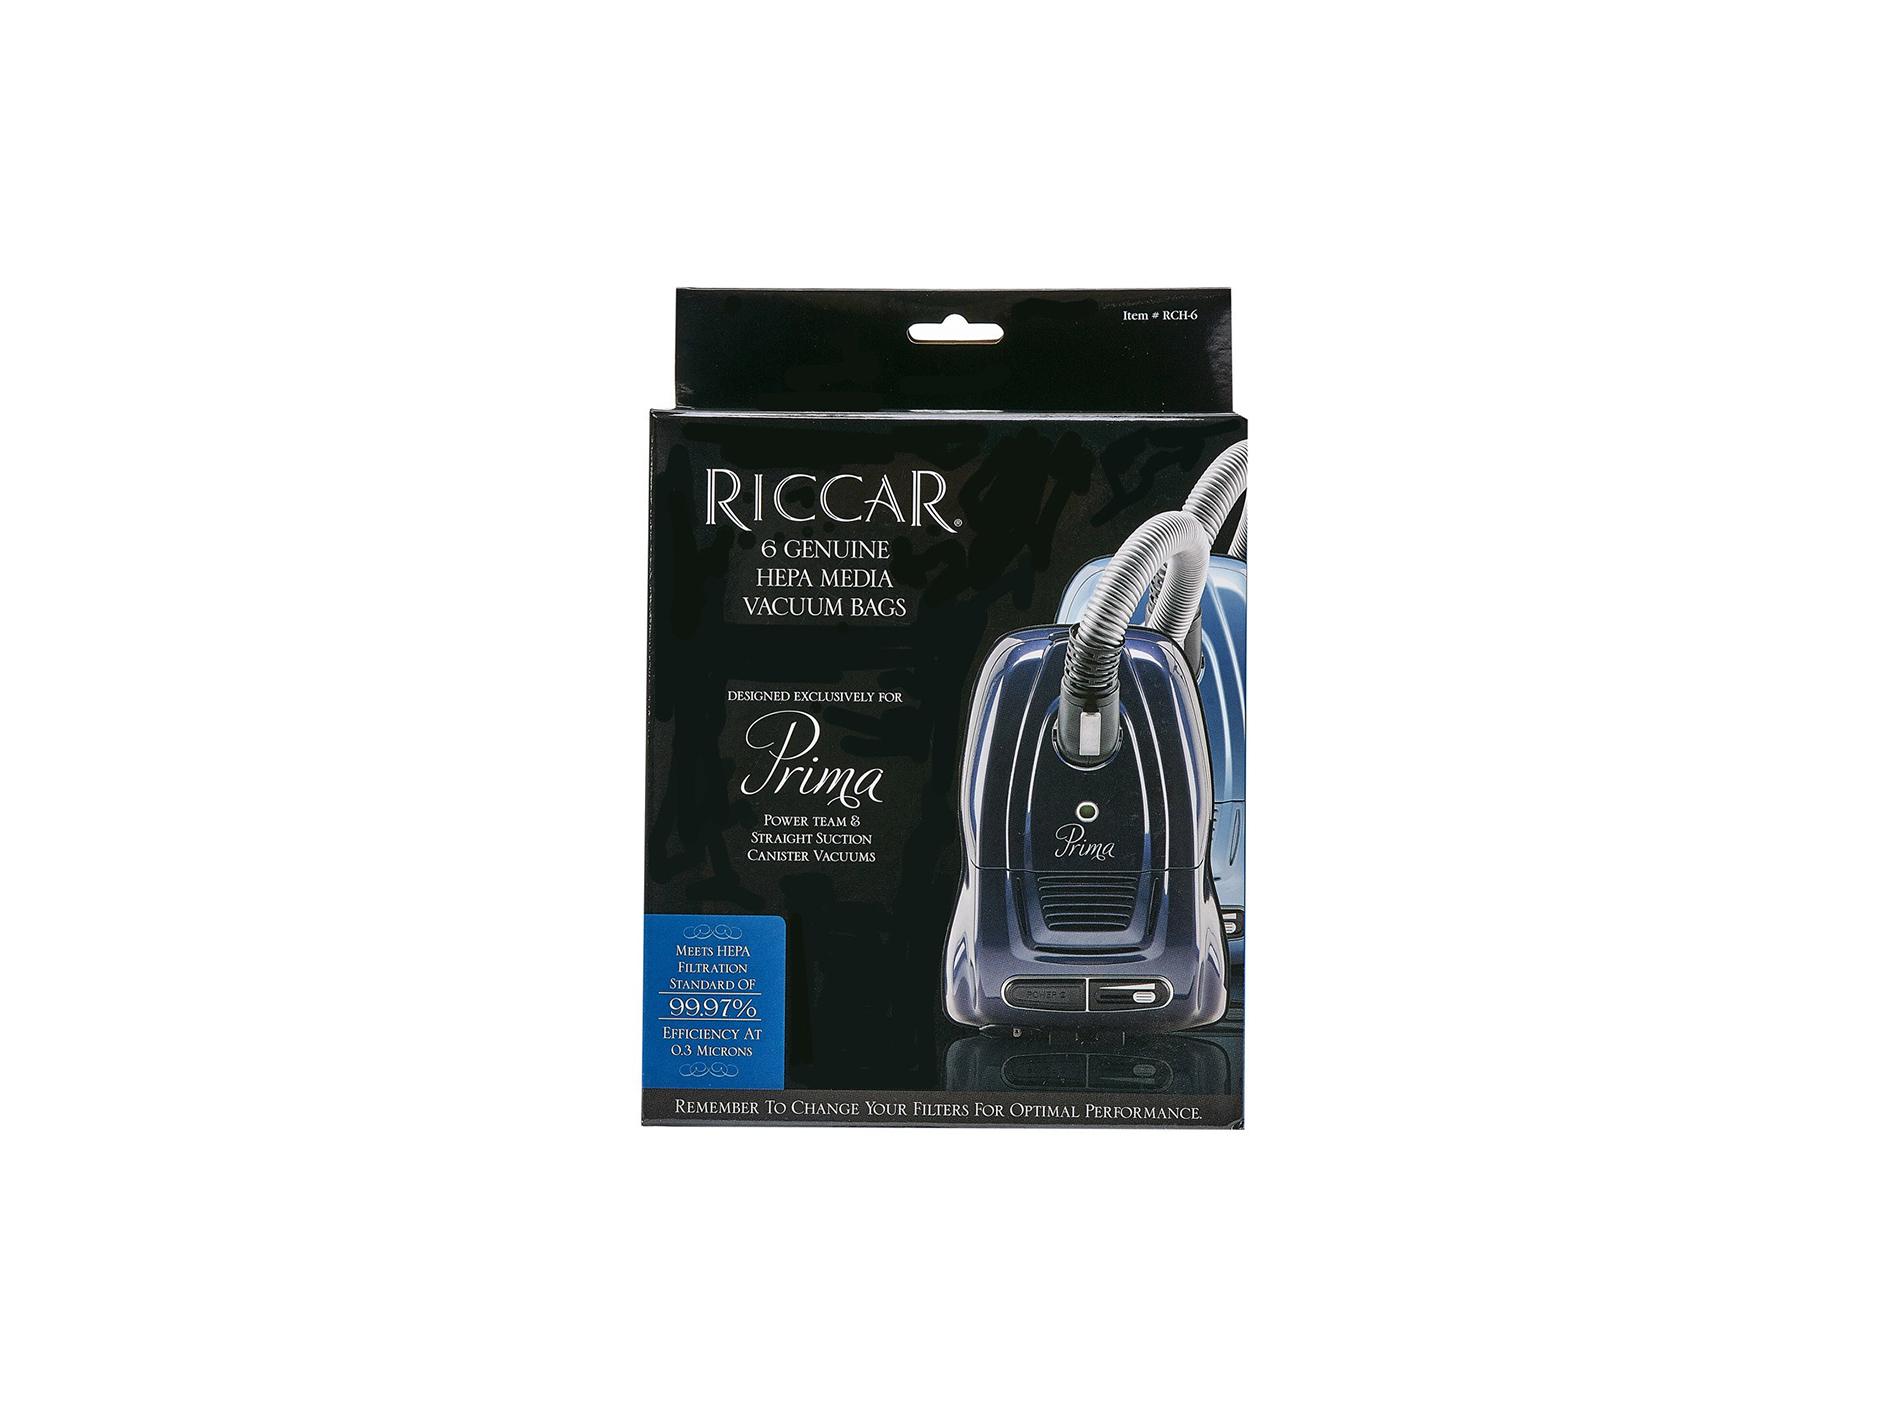 Riccar Prima Hepa Media Bags Cardy Vacuum